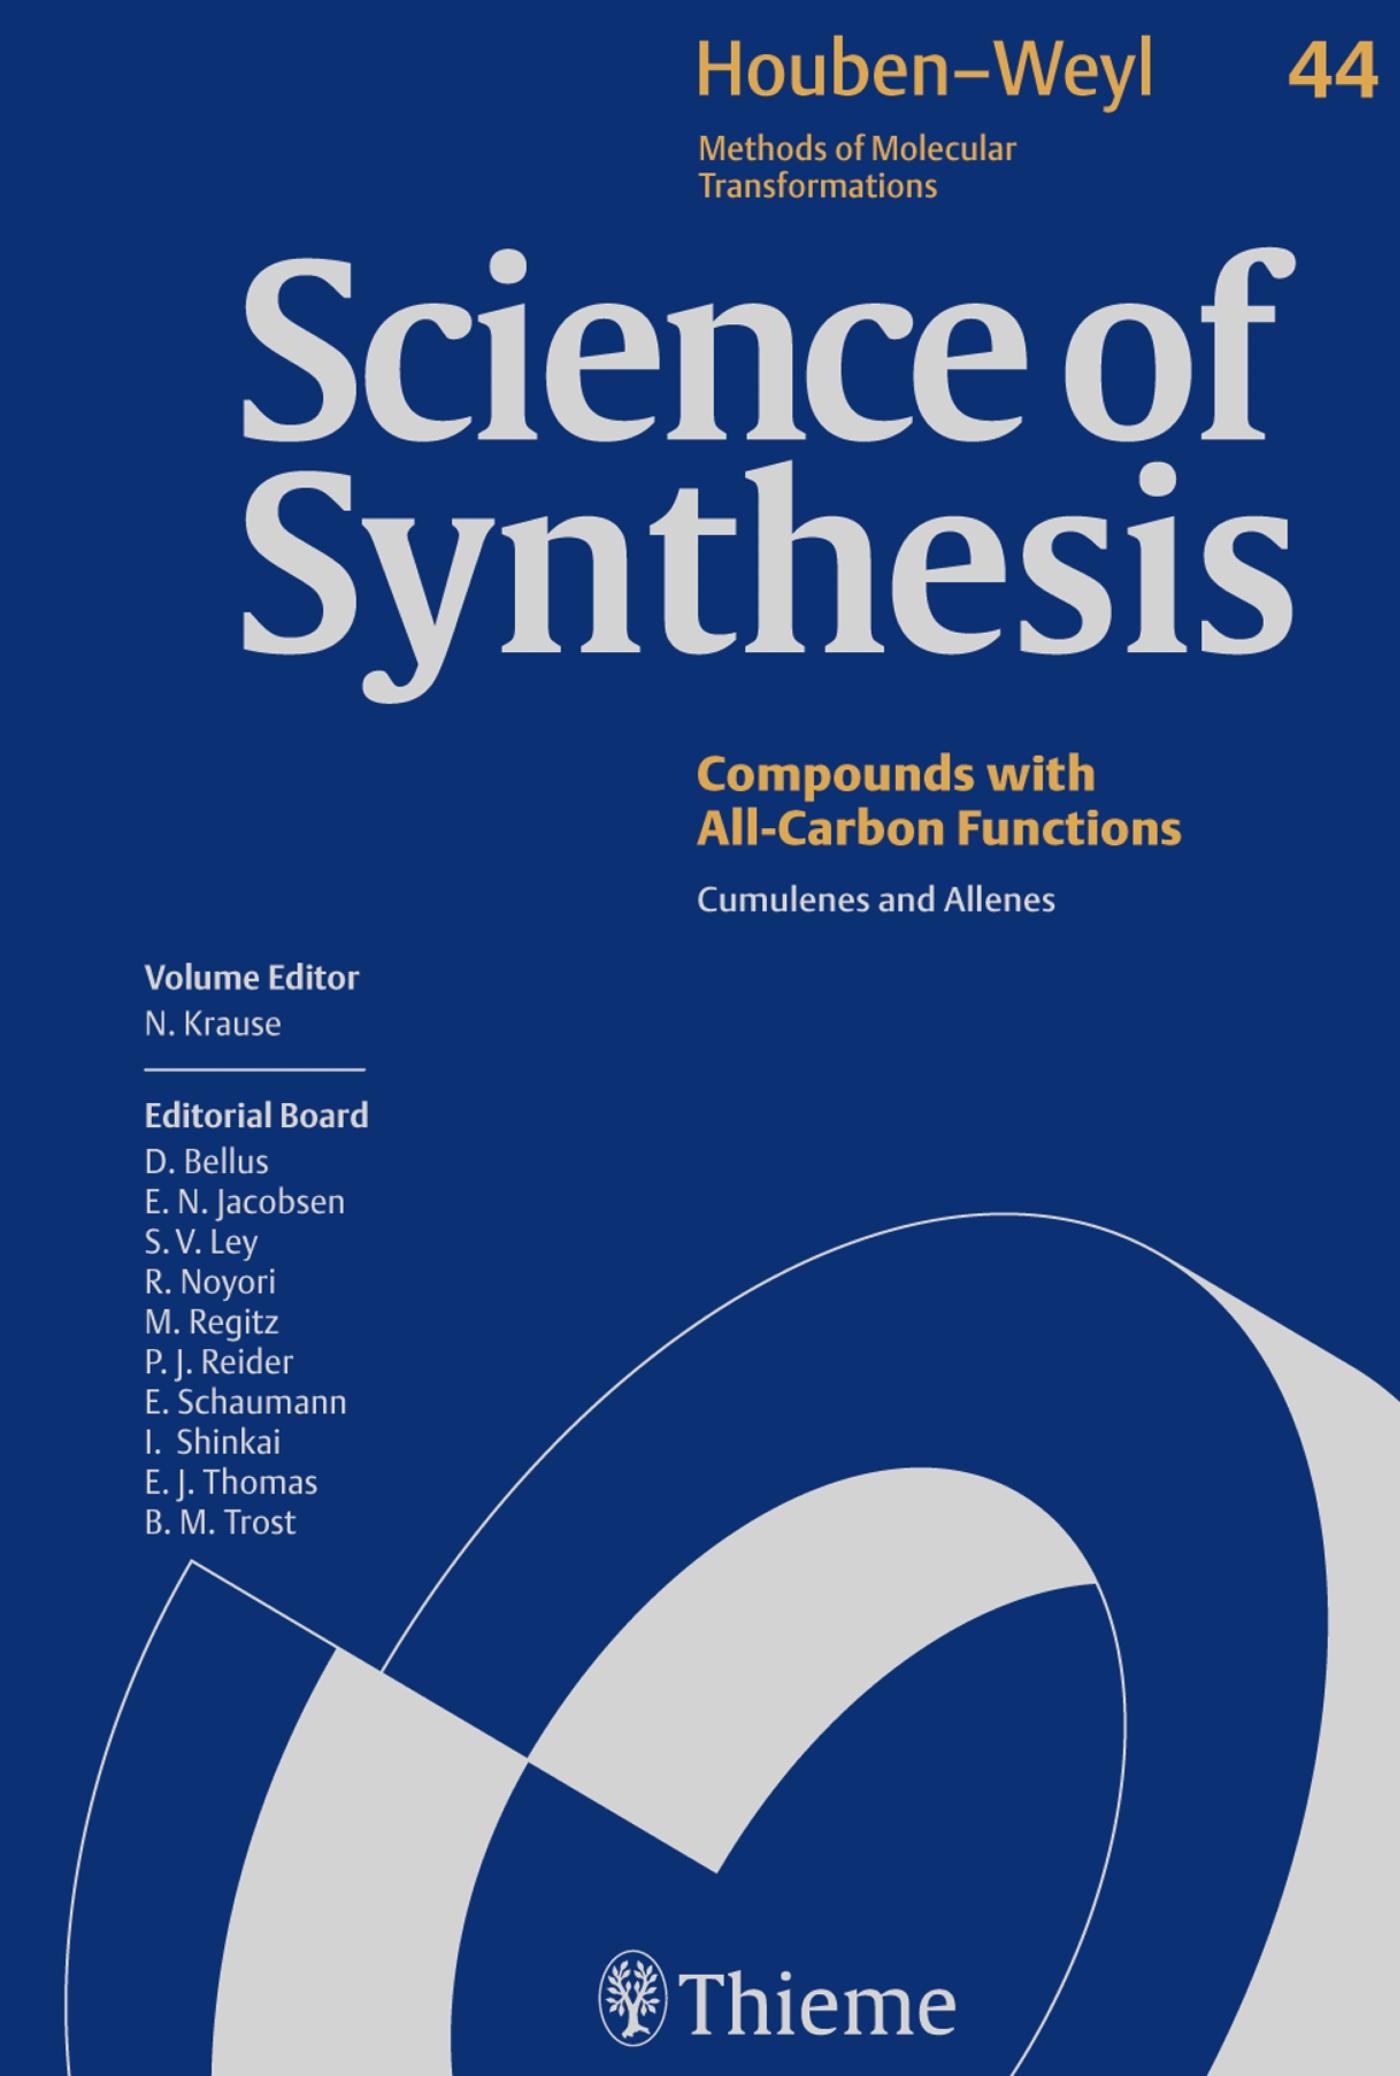 Science of Synthesis: Houben-Weyl Methods of Molecular Transformations  Vol. 44